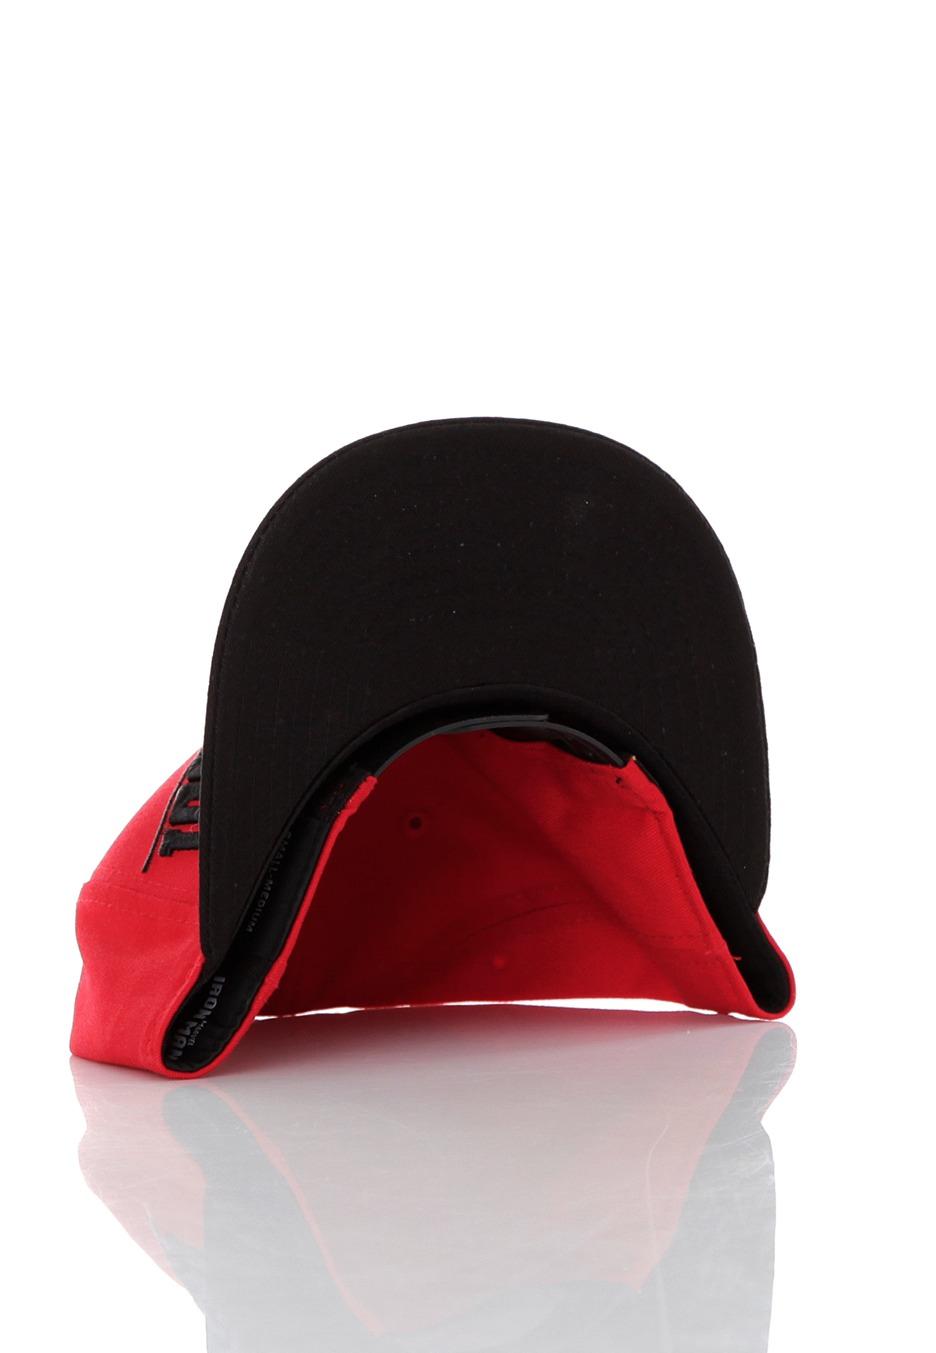 4c9a4f6f9 New Era - Breaker Snap Ironman Red/Black Snapback - Cappello ...